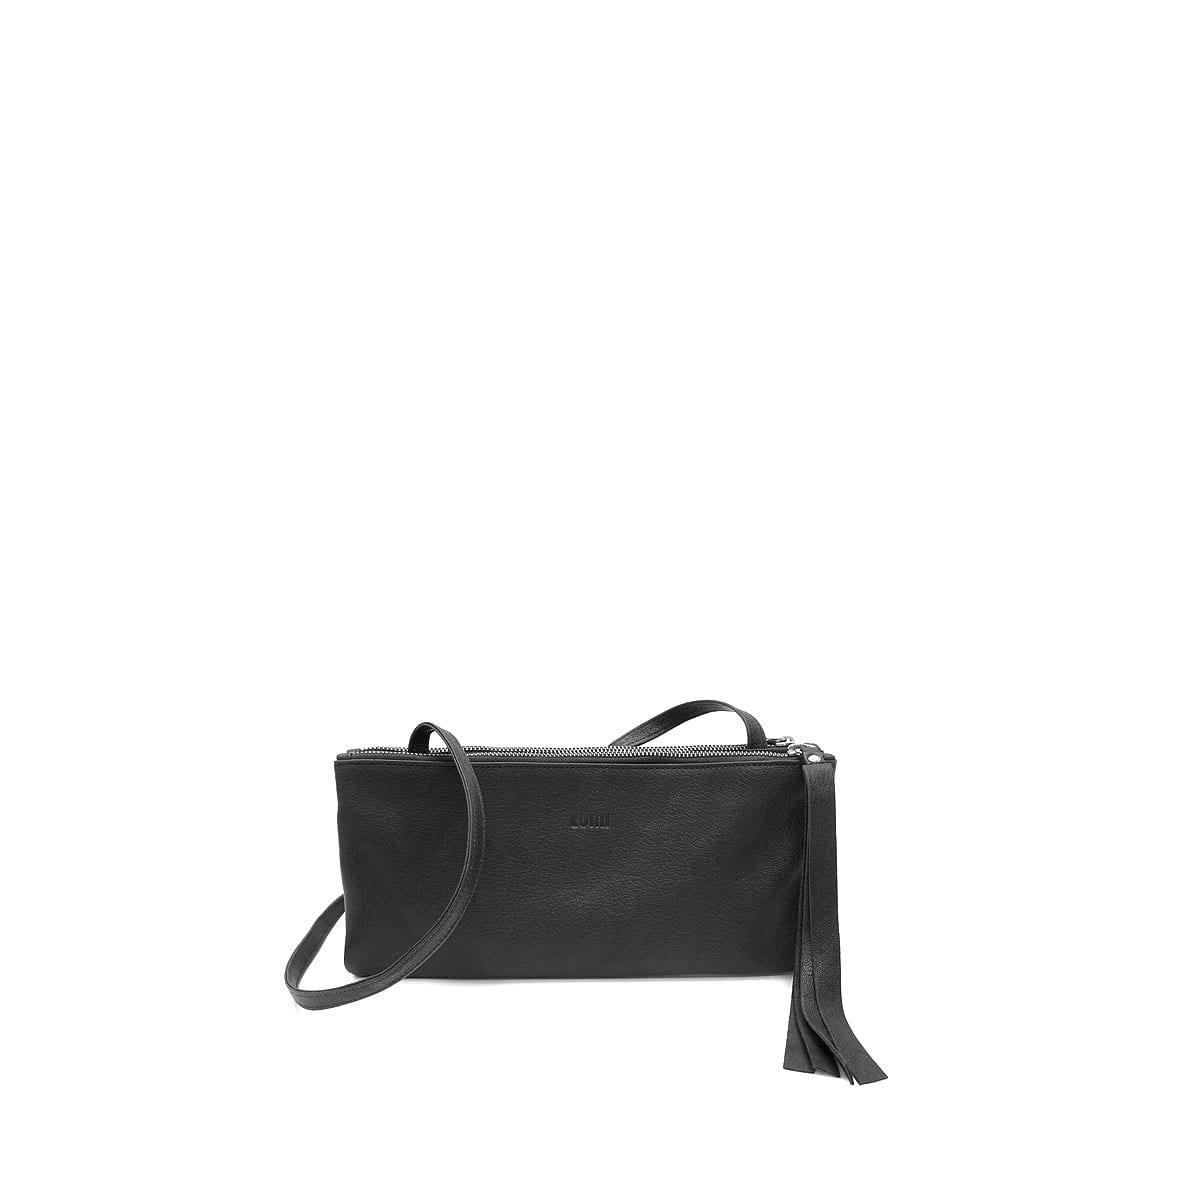 LUMI Inkeri Double Clutch, in black.